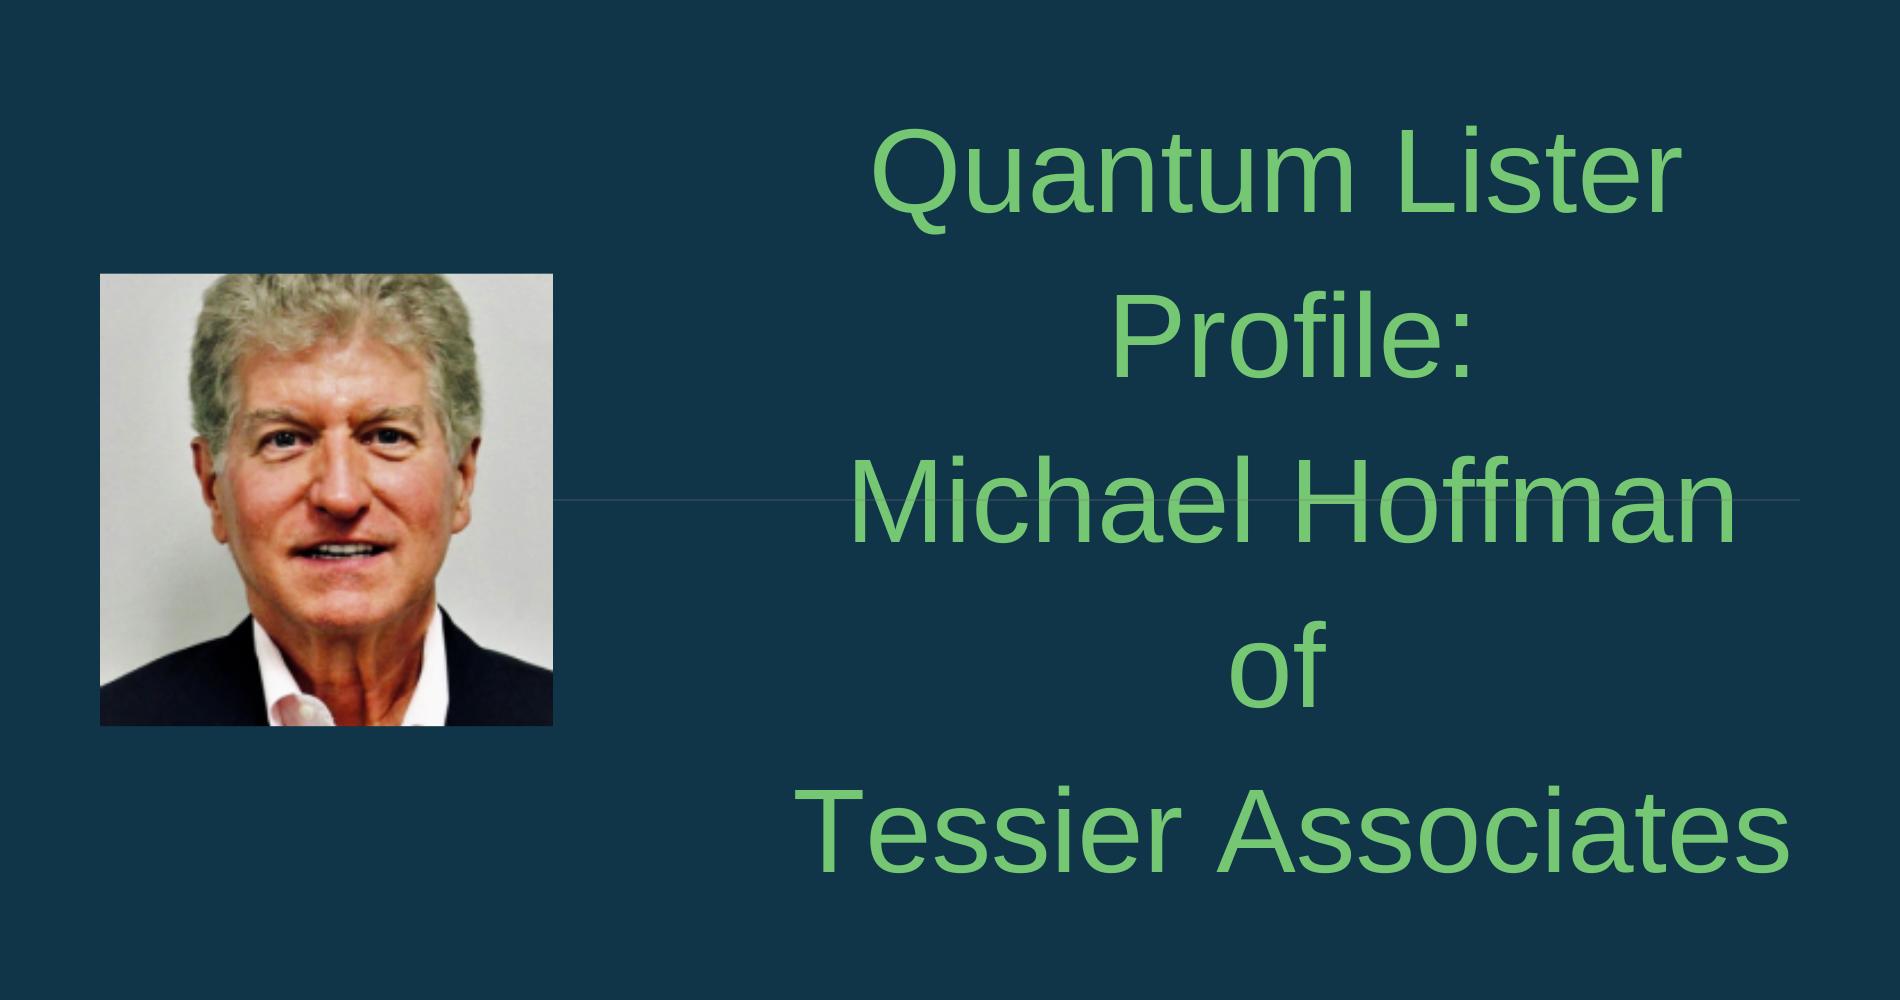 Quantum Lister Profile: Michael Hoffman of Tessier Associates